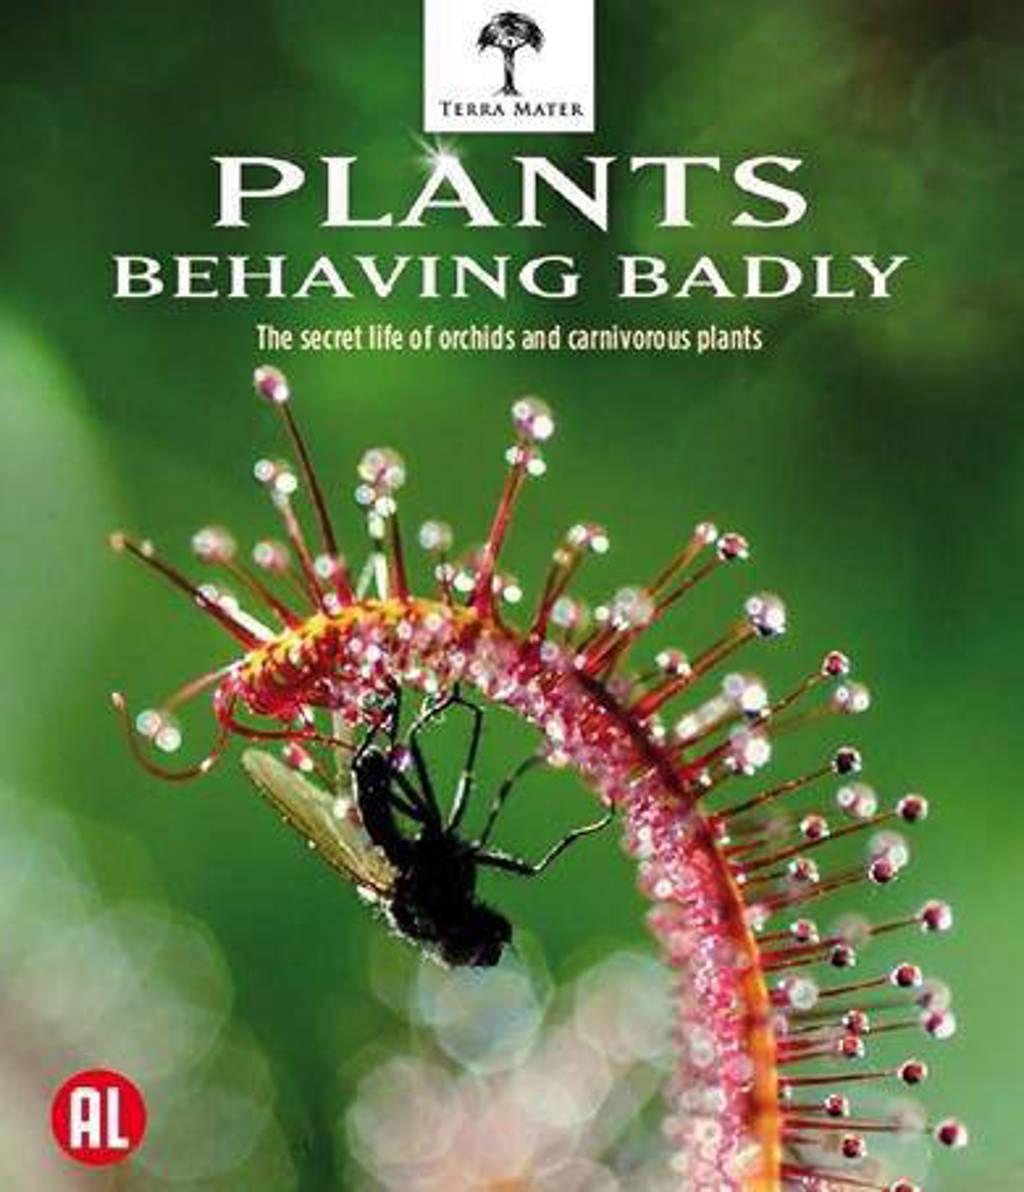 Plants behaving badly (Blu-ray)